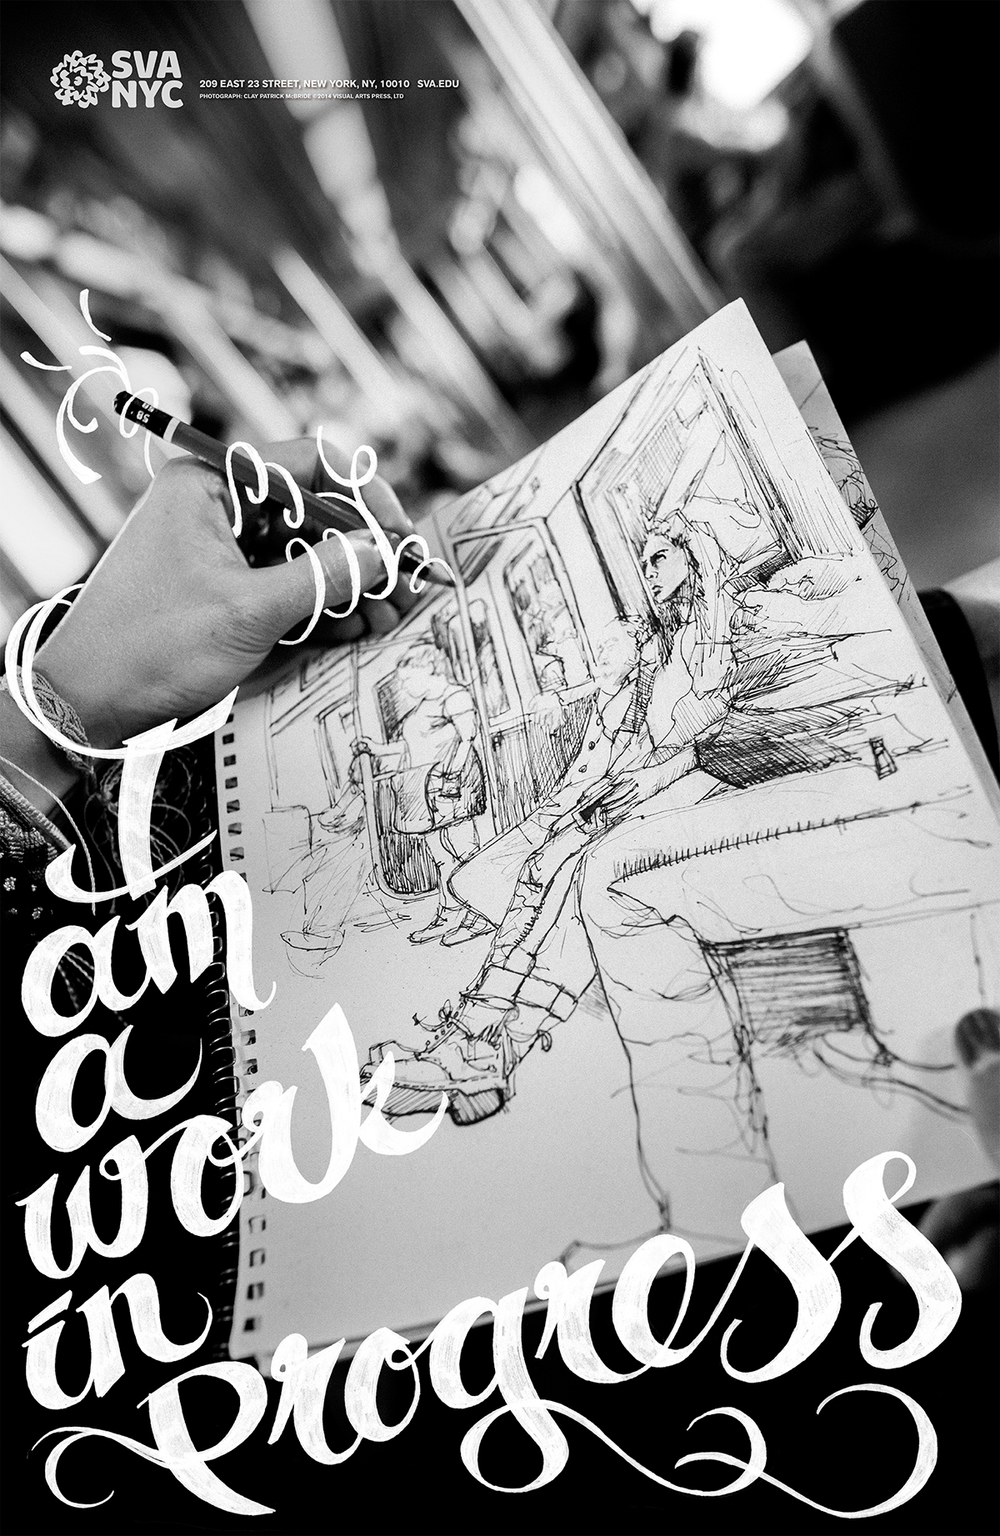 School of Visual Arts Subway Campaign